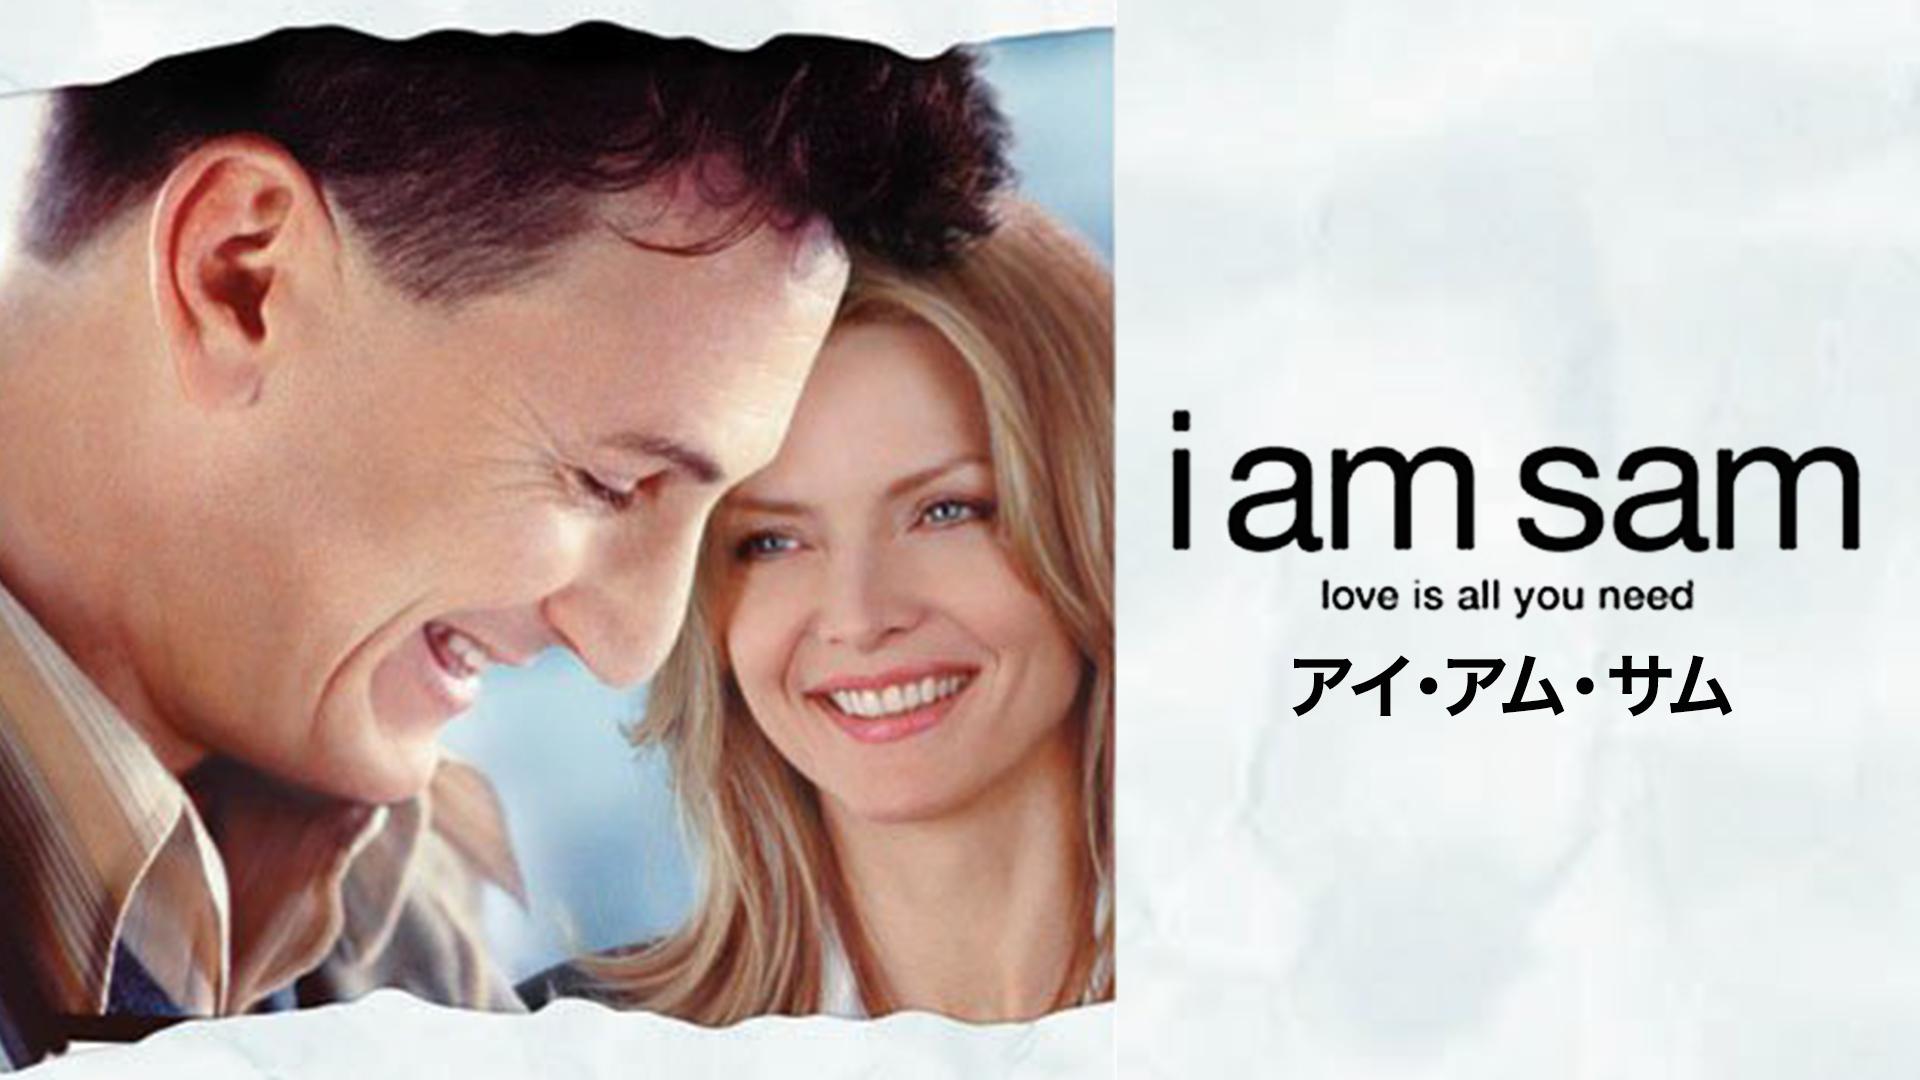 I am Sam アイ・アム・サム 動画